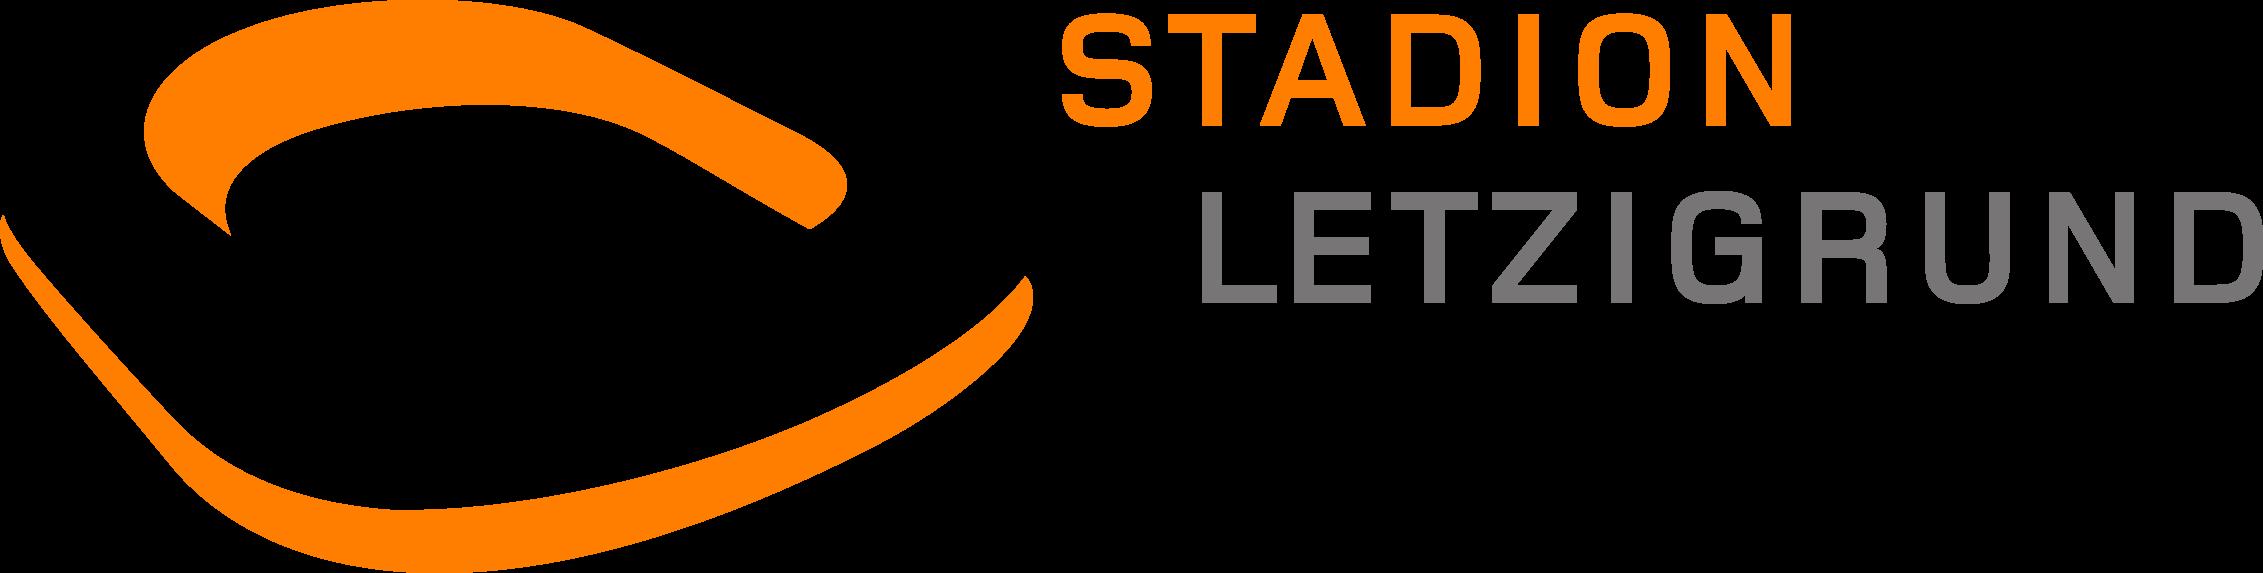 Stadion Letzigrund Logo